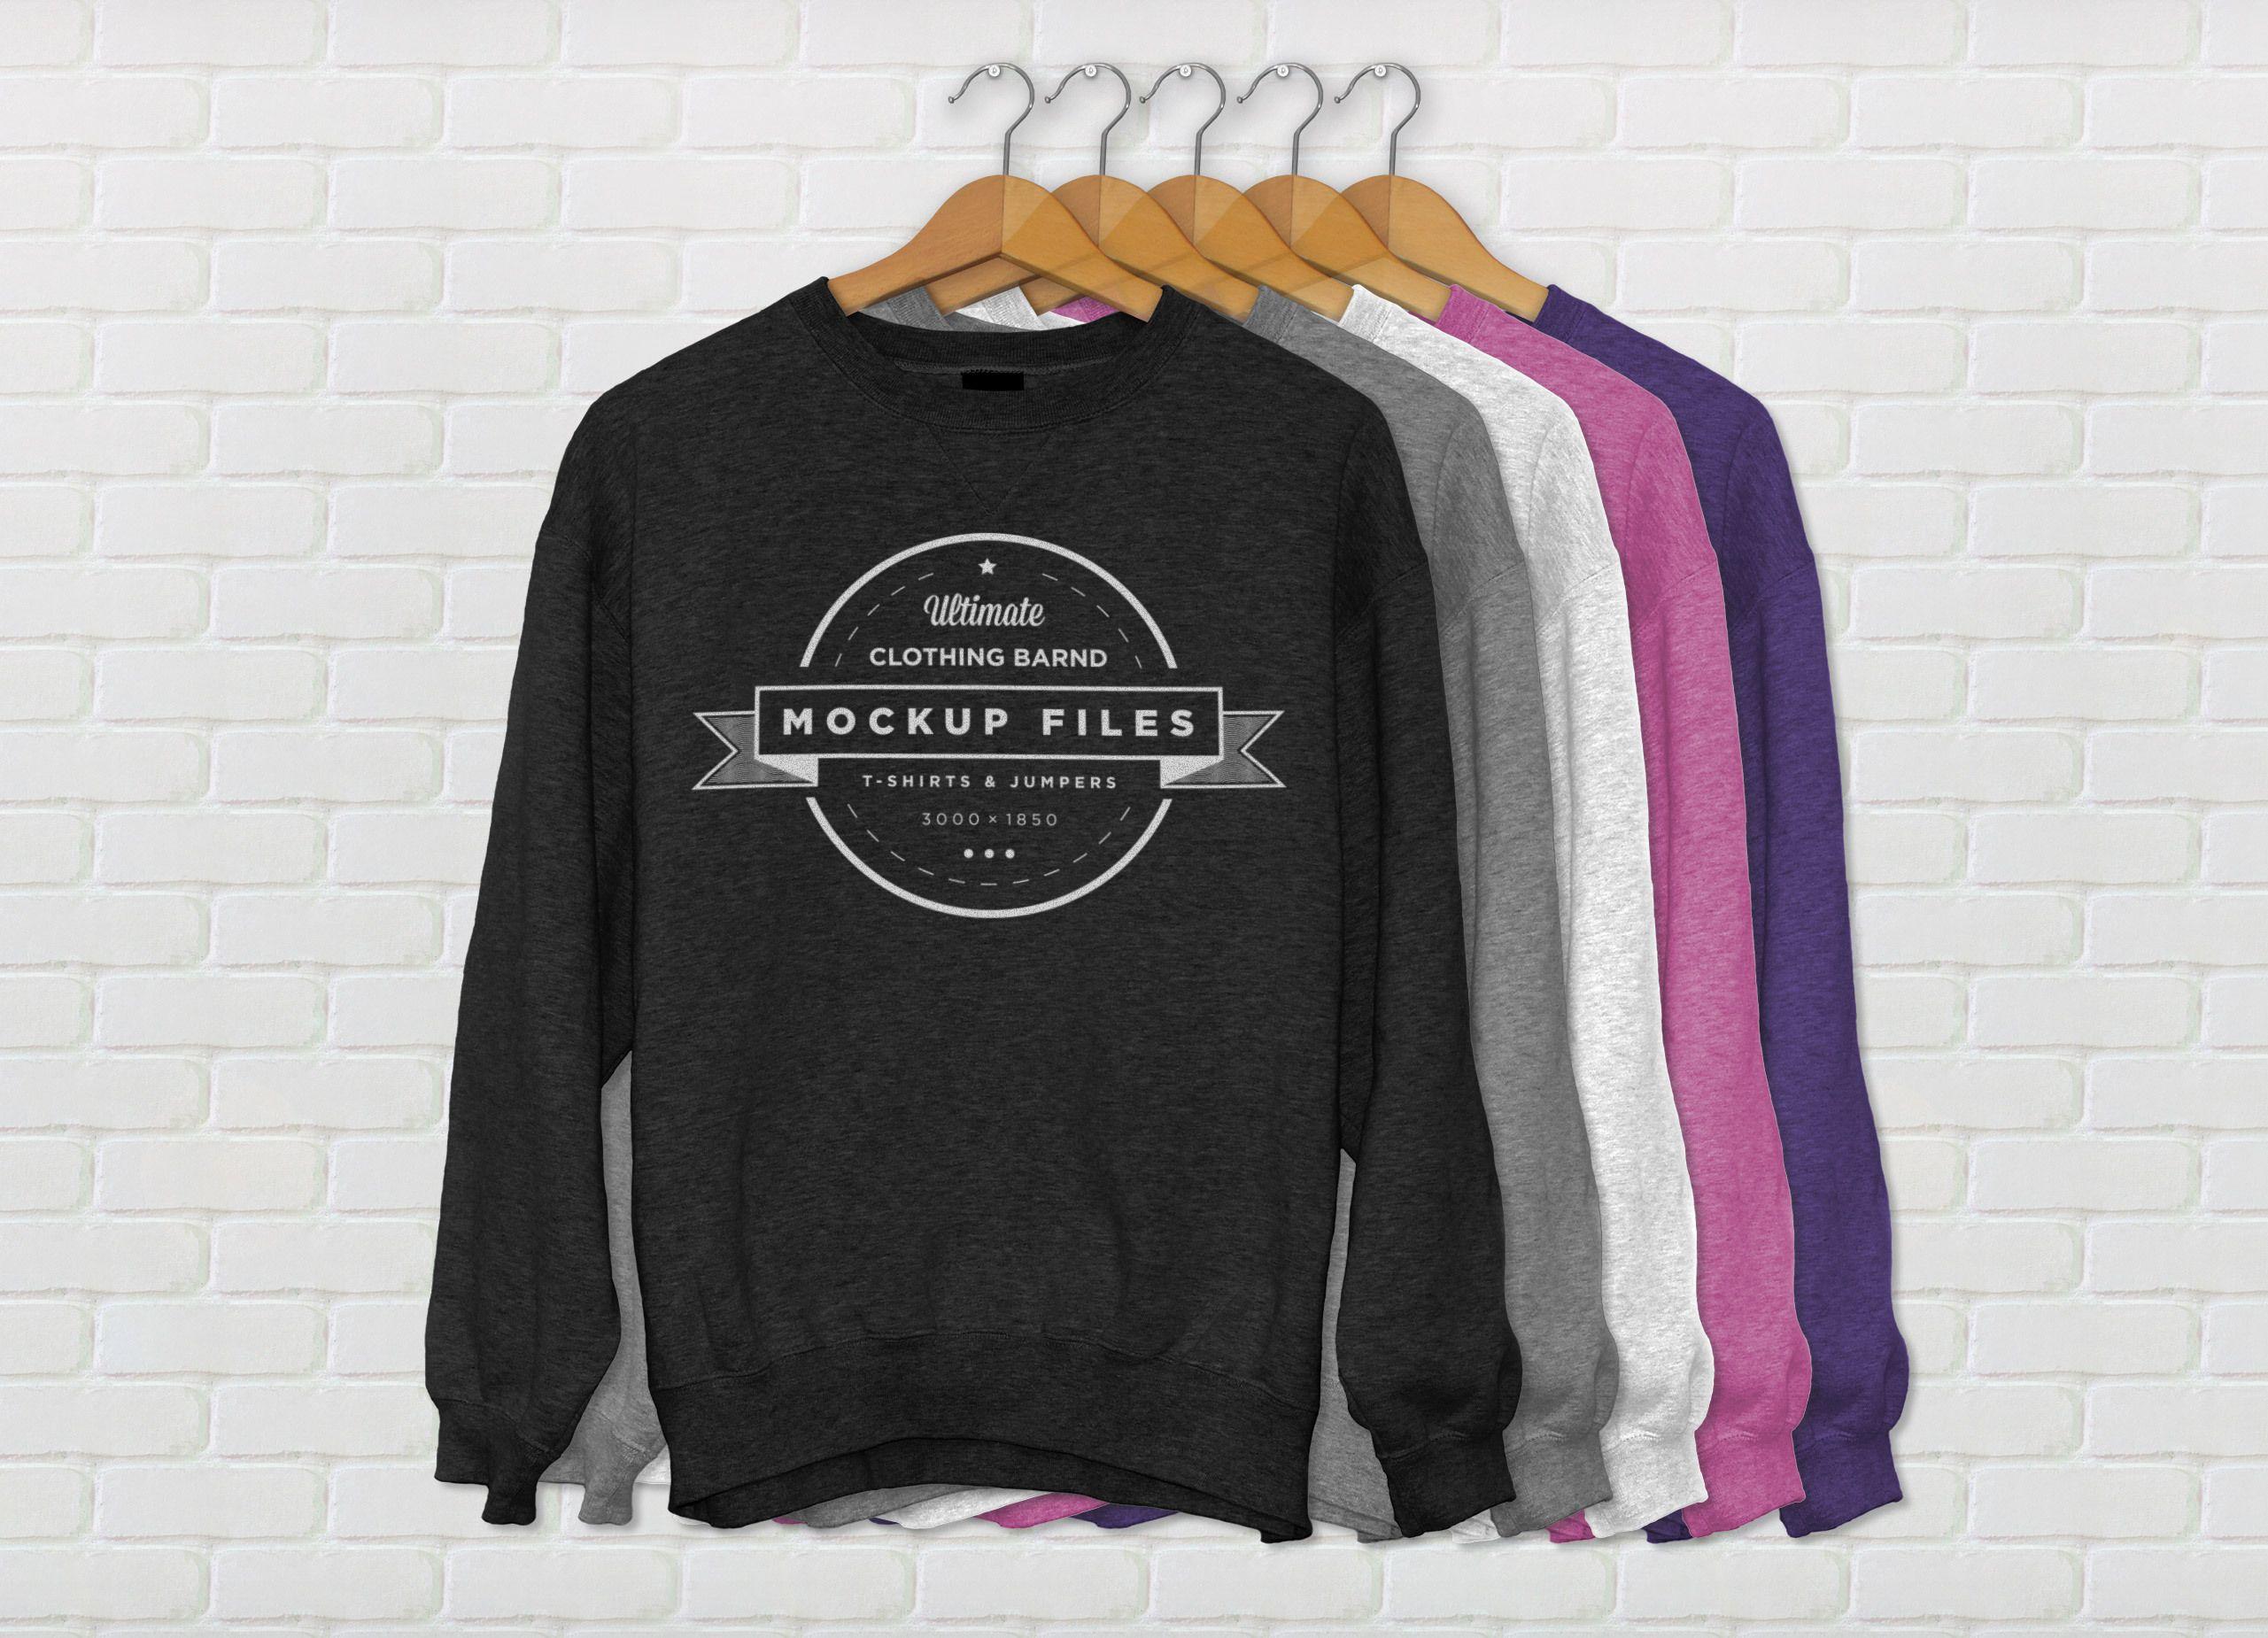 19 Free Blank T Shirt Template Designs | Templates | Pinterest ...